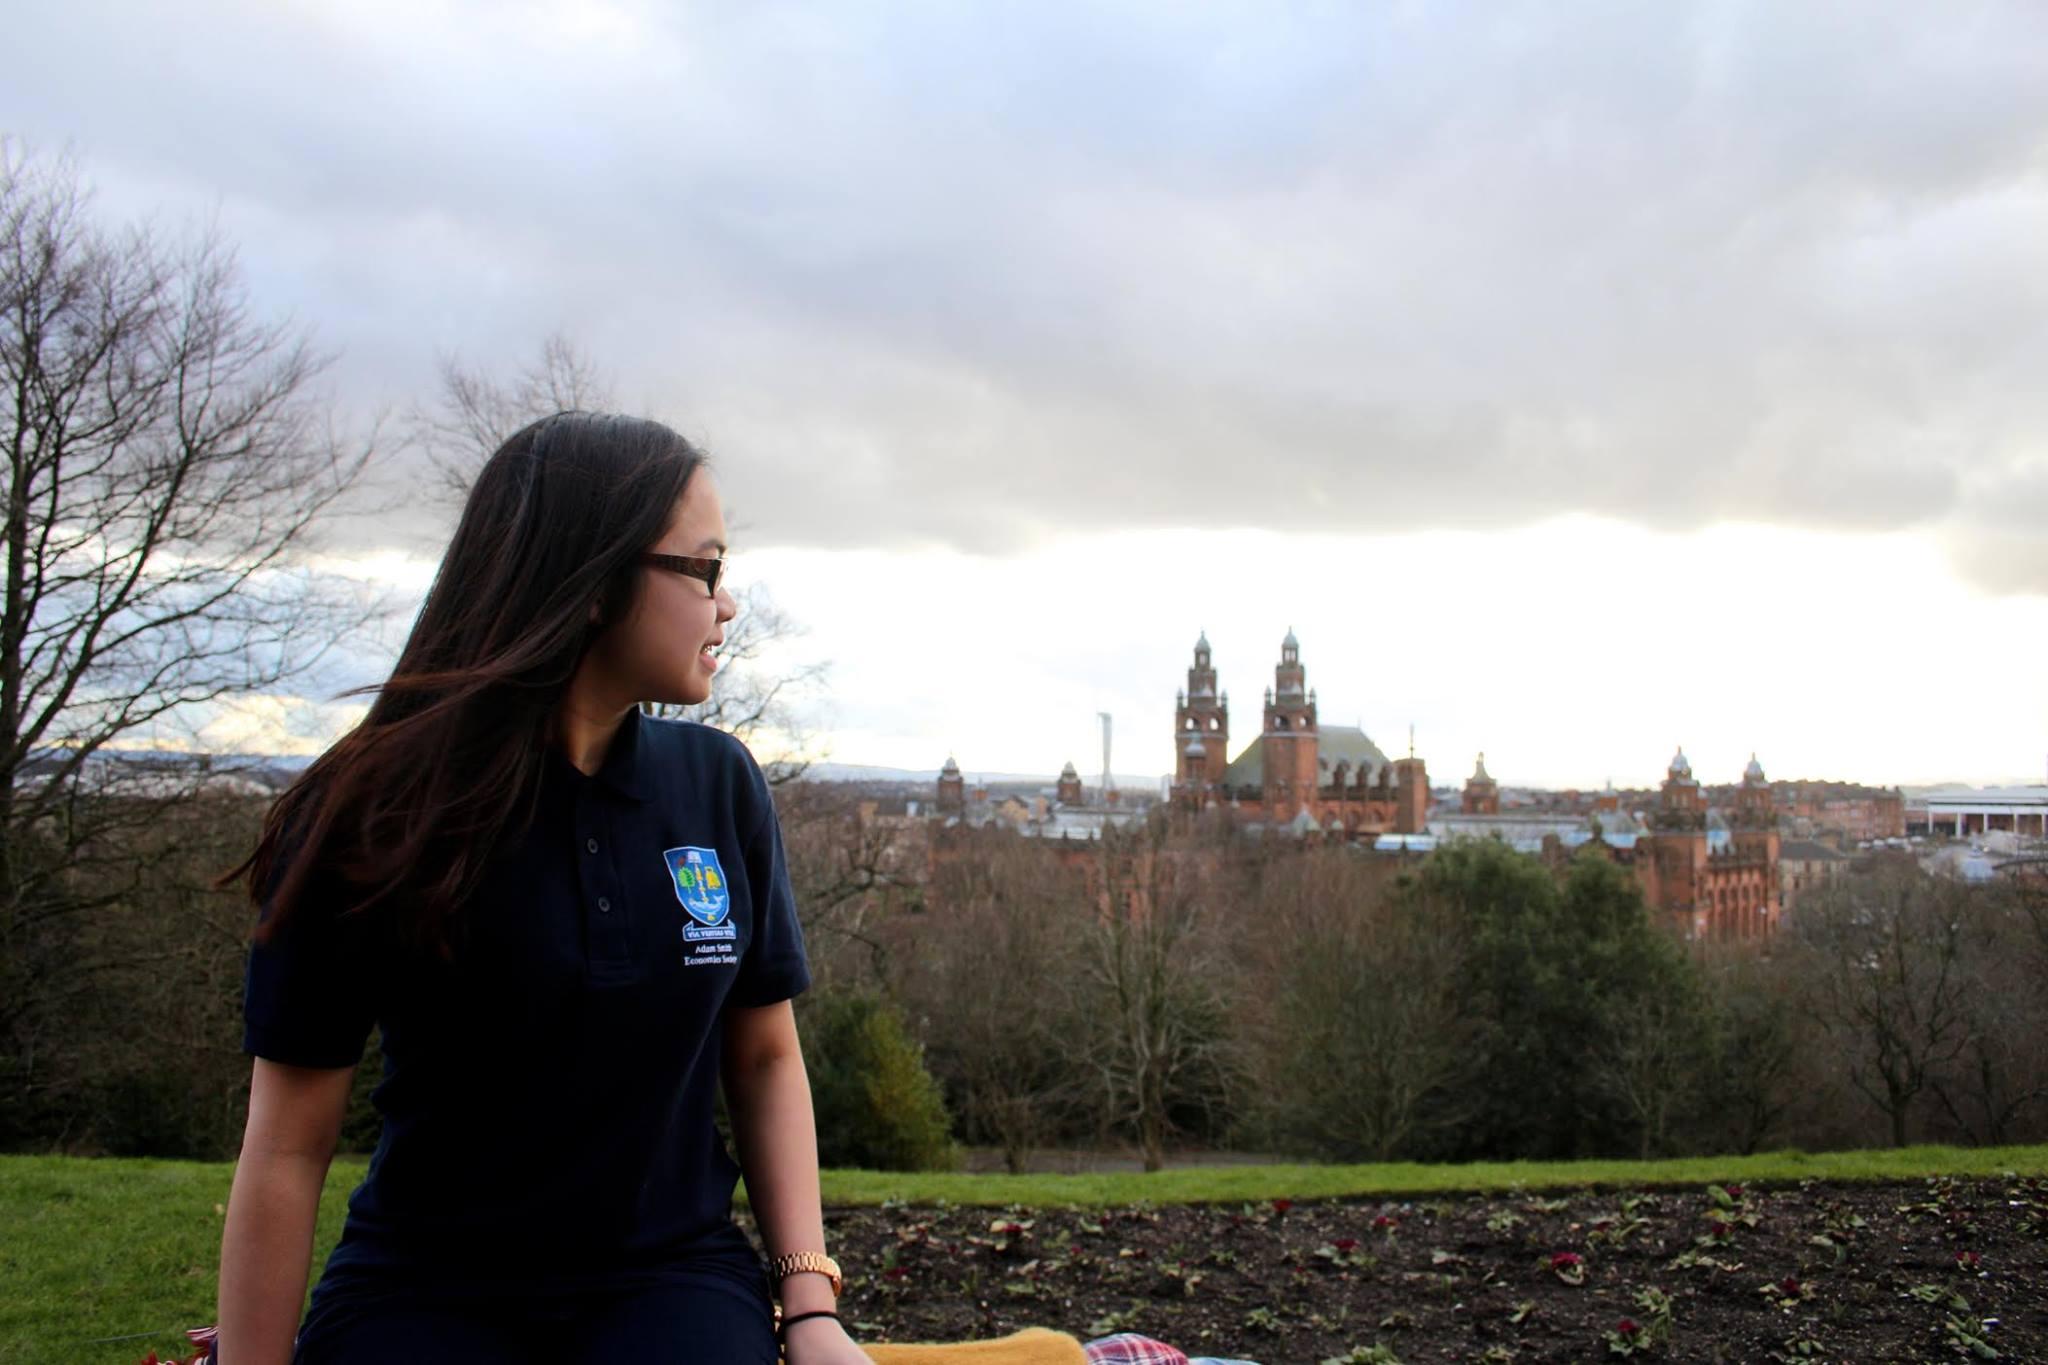 University of Glasgow UniMatch